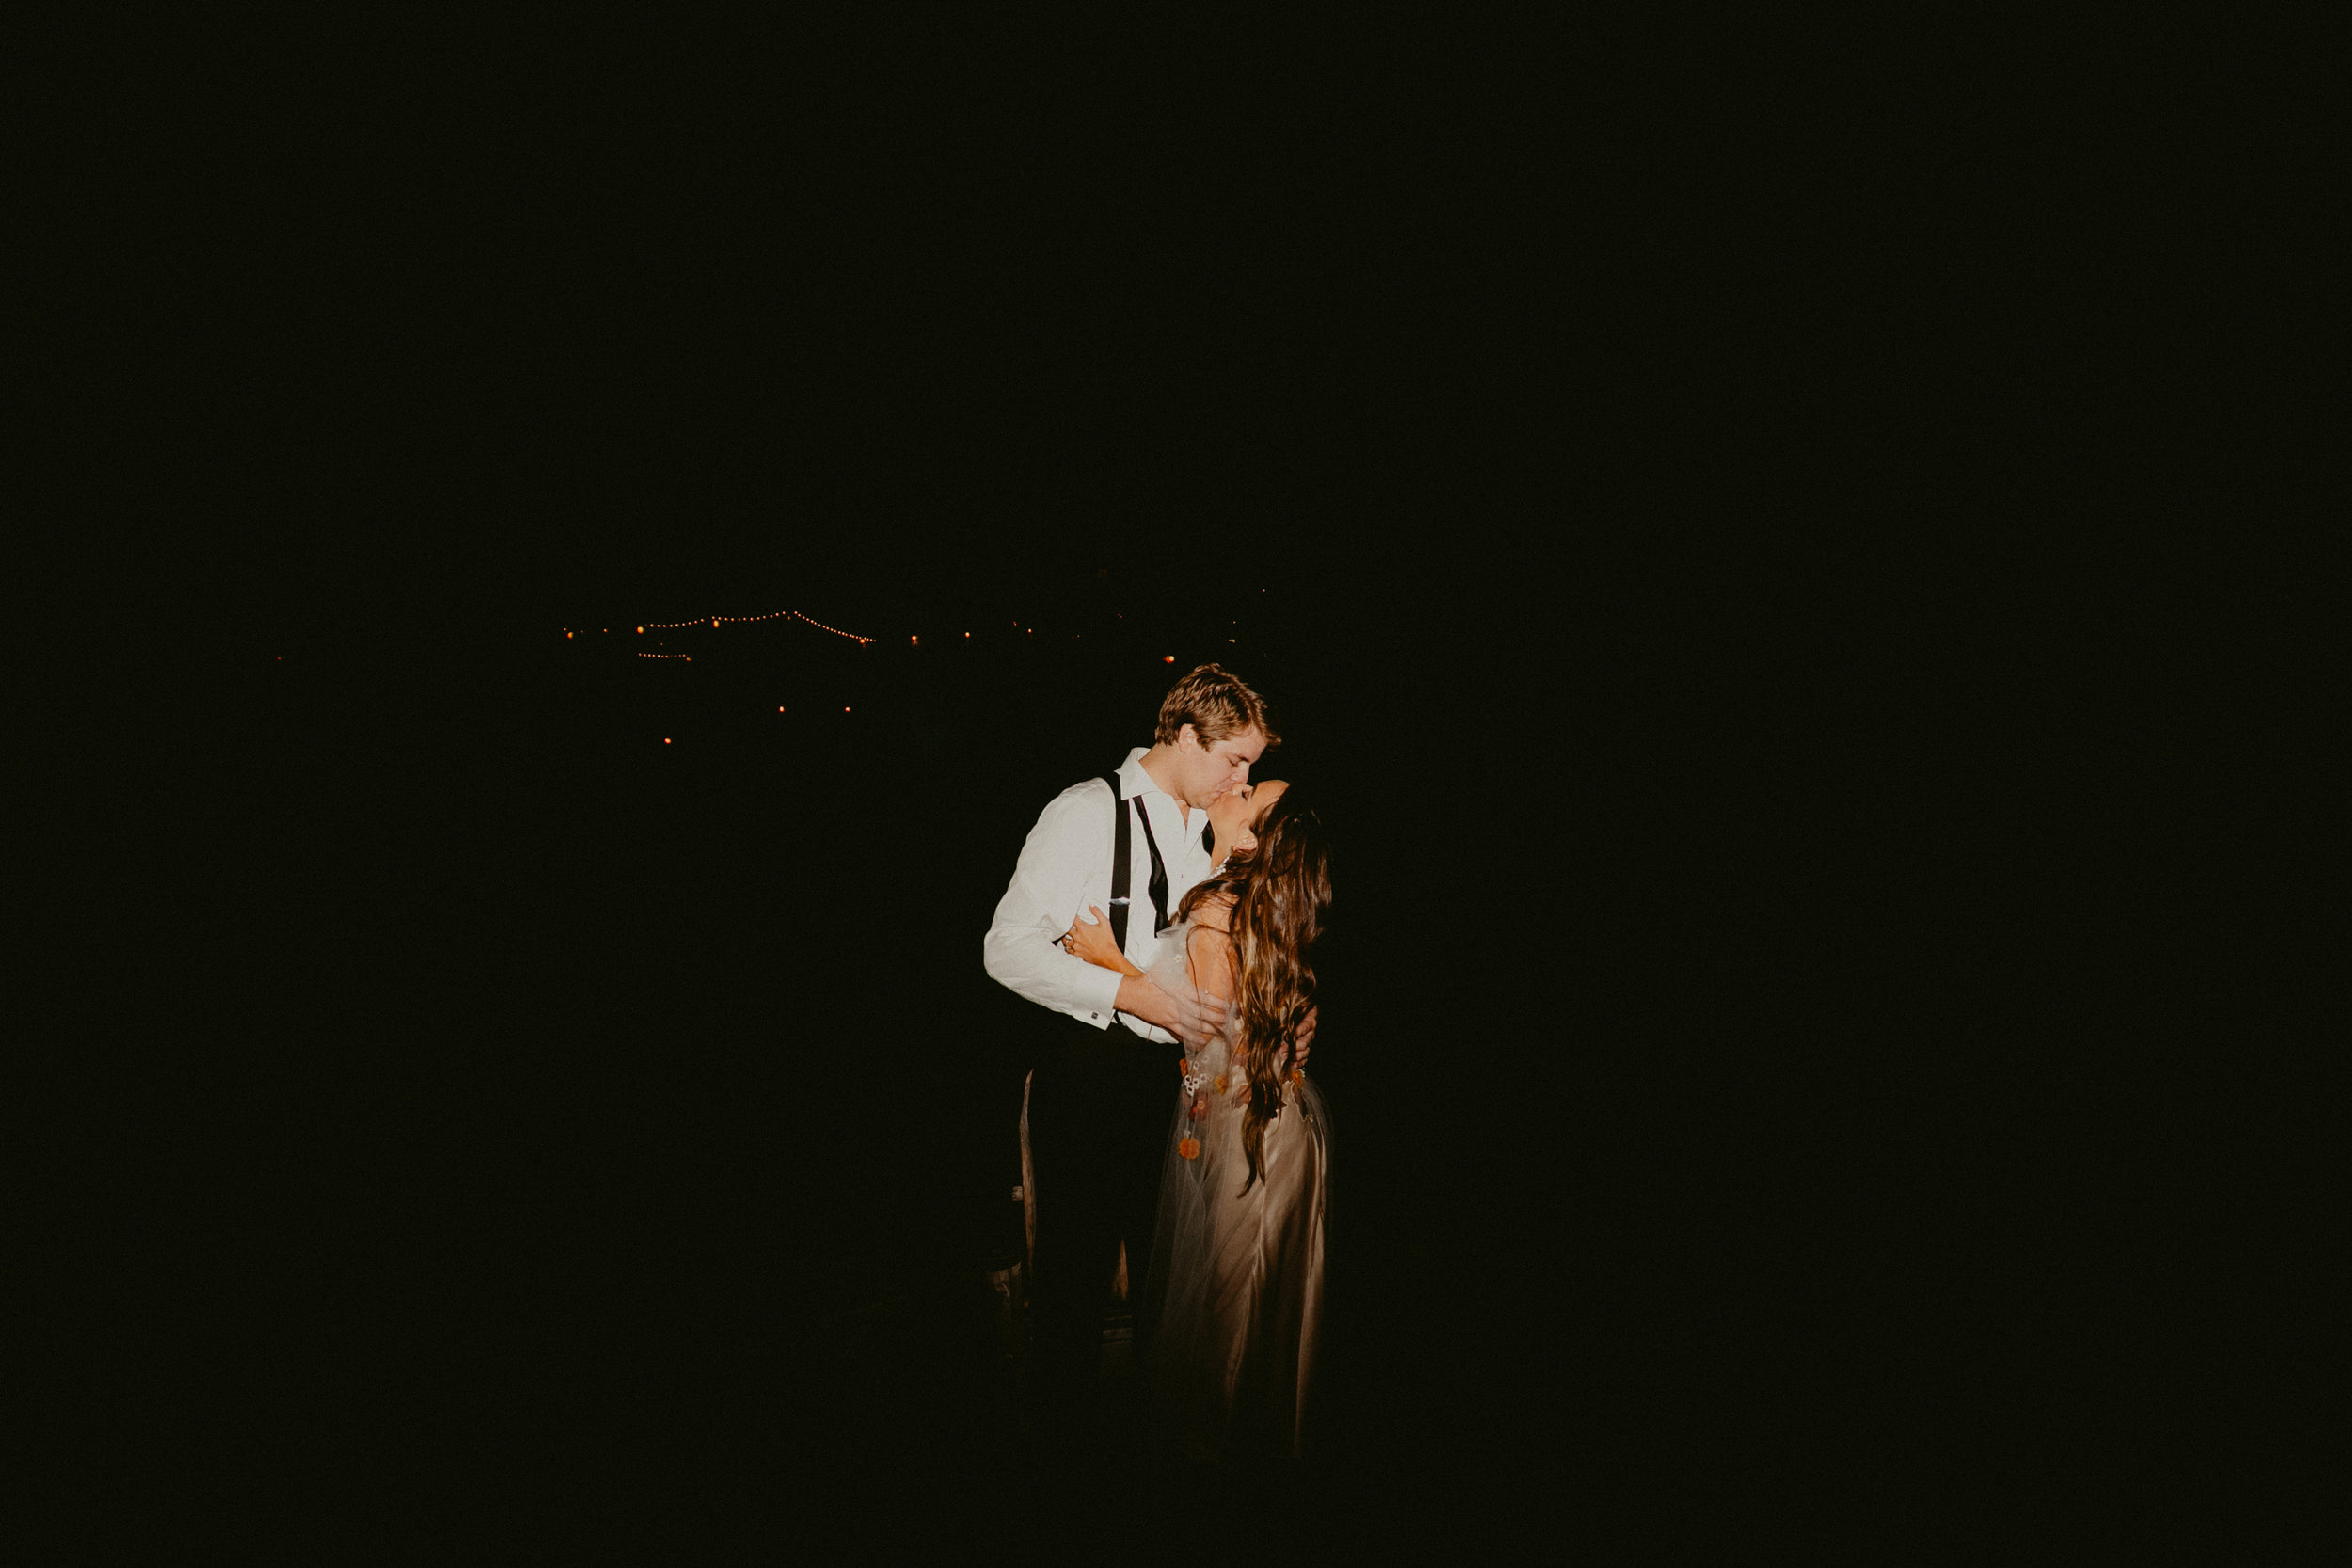 DEER_MOUNTAIN_INN_WEDDING_CHELLISE_MICHAEL_PHOTOGRAPHY-1740.jpg